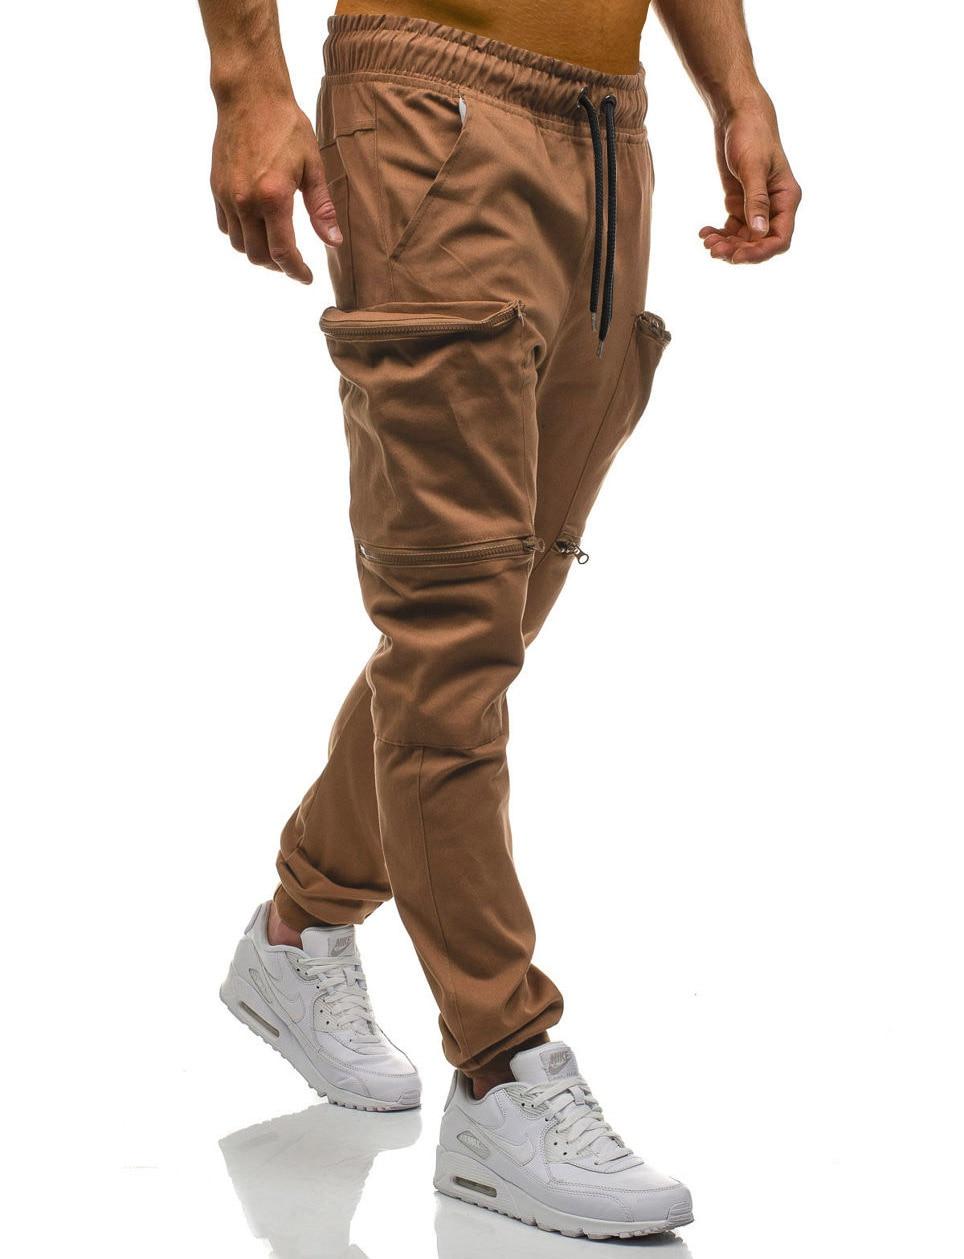 HTB1nQrgL9zqK1RjSZFjq6zlCFXaU Mens Joggers 2019 New Red Camouflage Multi-Pockets Cargo Pants Men Cotton Harem Pants Hip Hop Trousers Streetwear XXXL